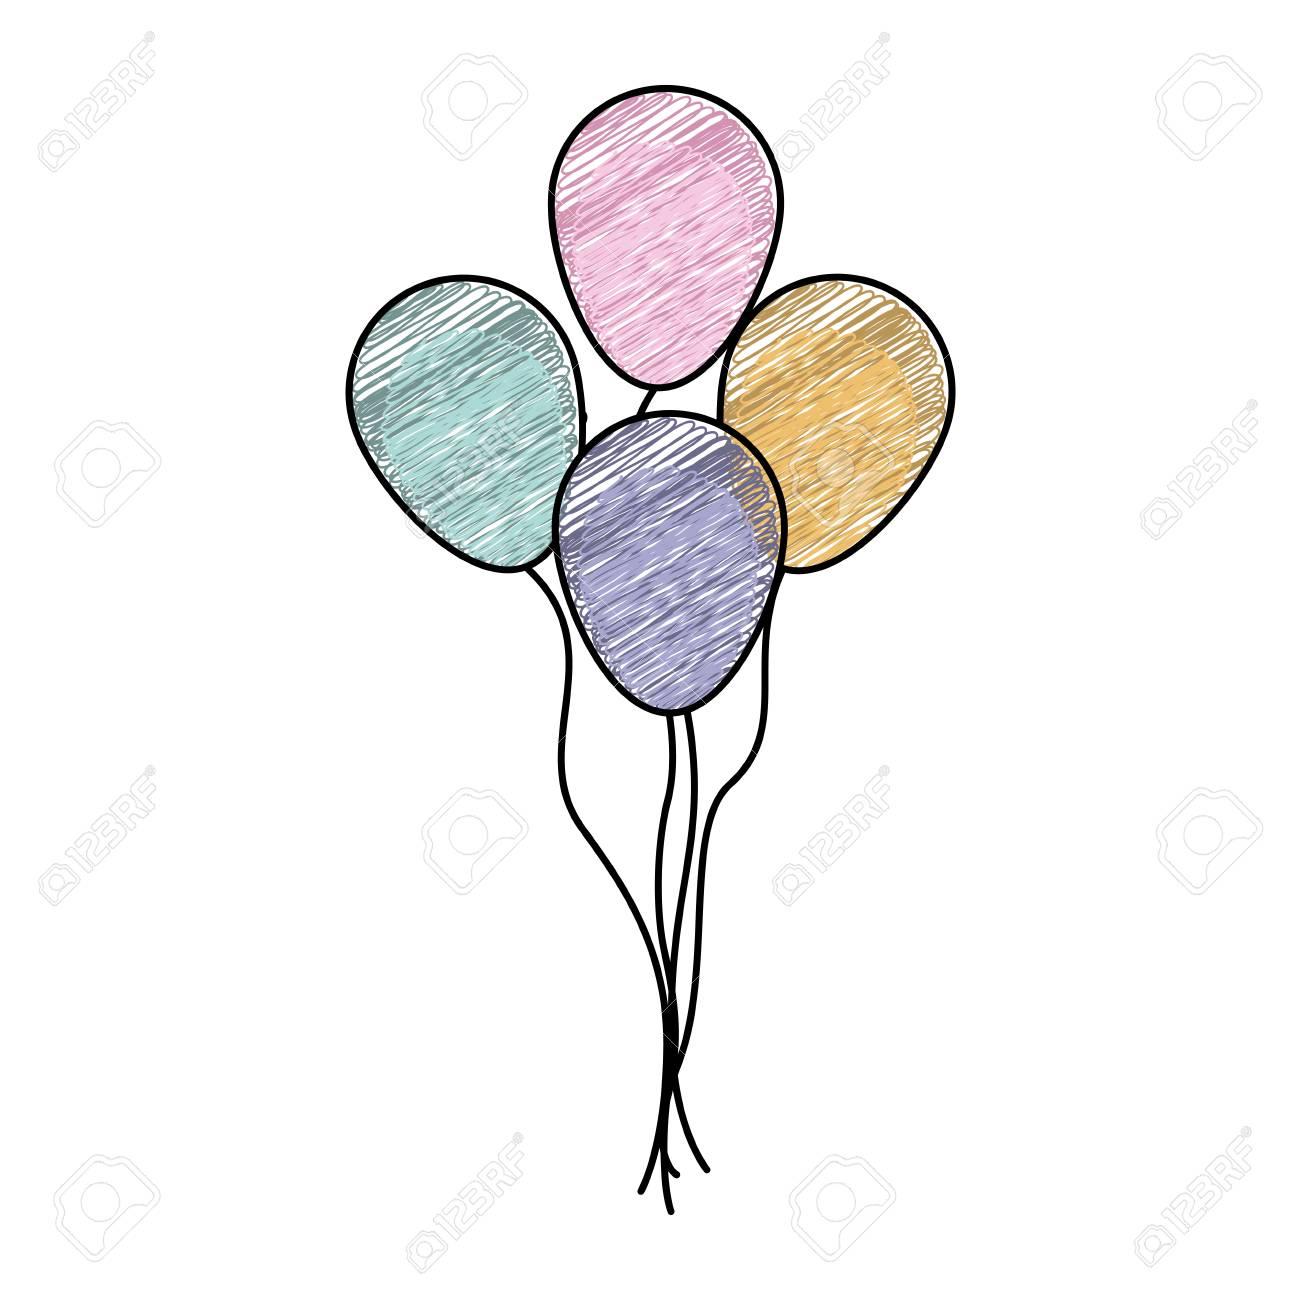 1300x1300 Color Pencil Drawing Of Set Decorative Balloons Vector